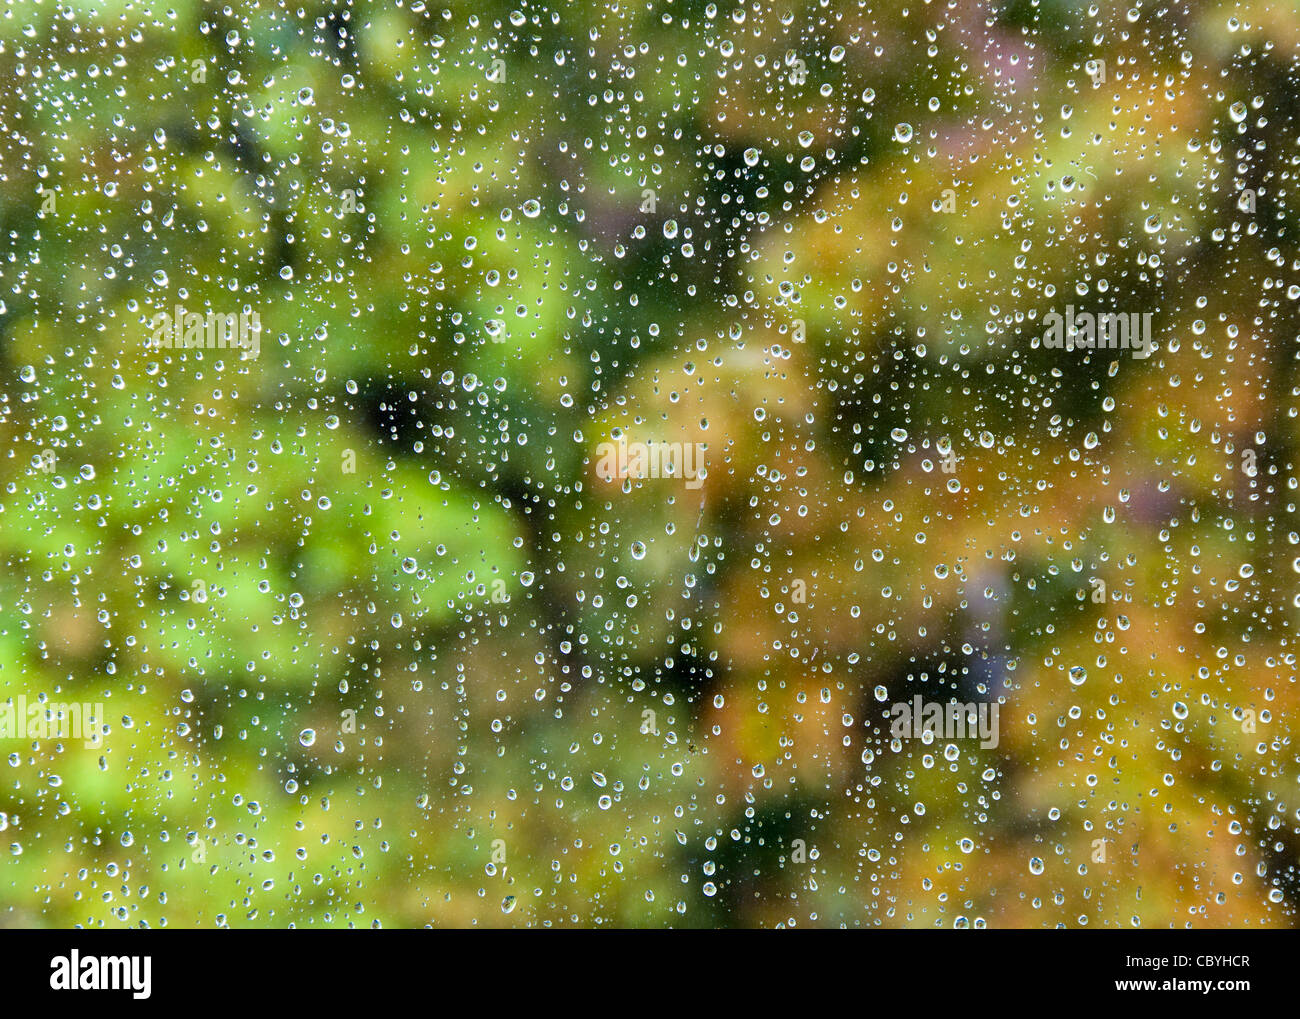 rain drops on window in autumn - Stock Image